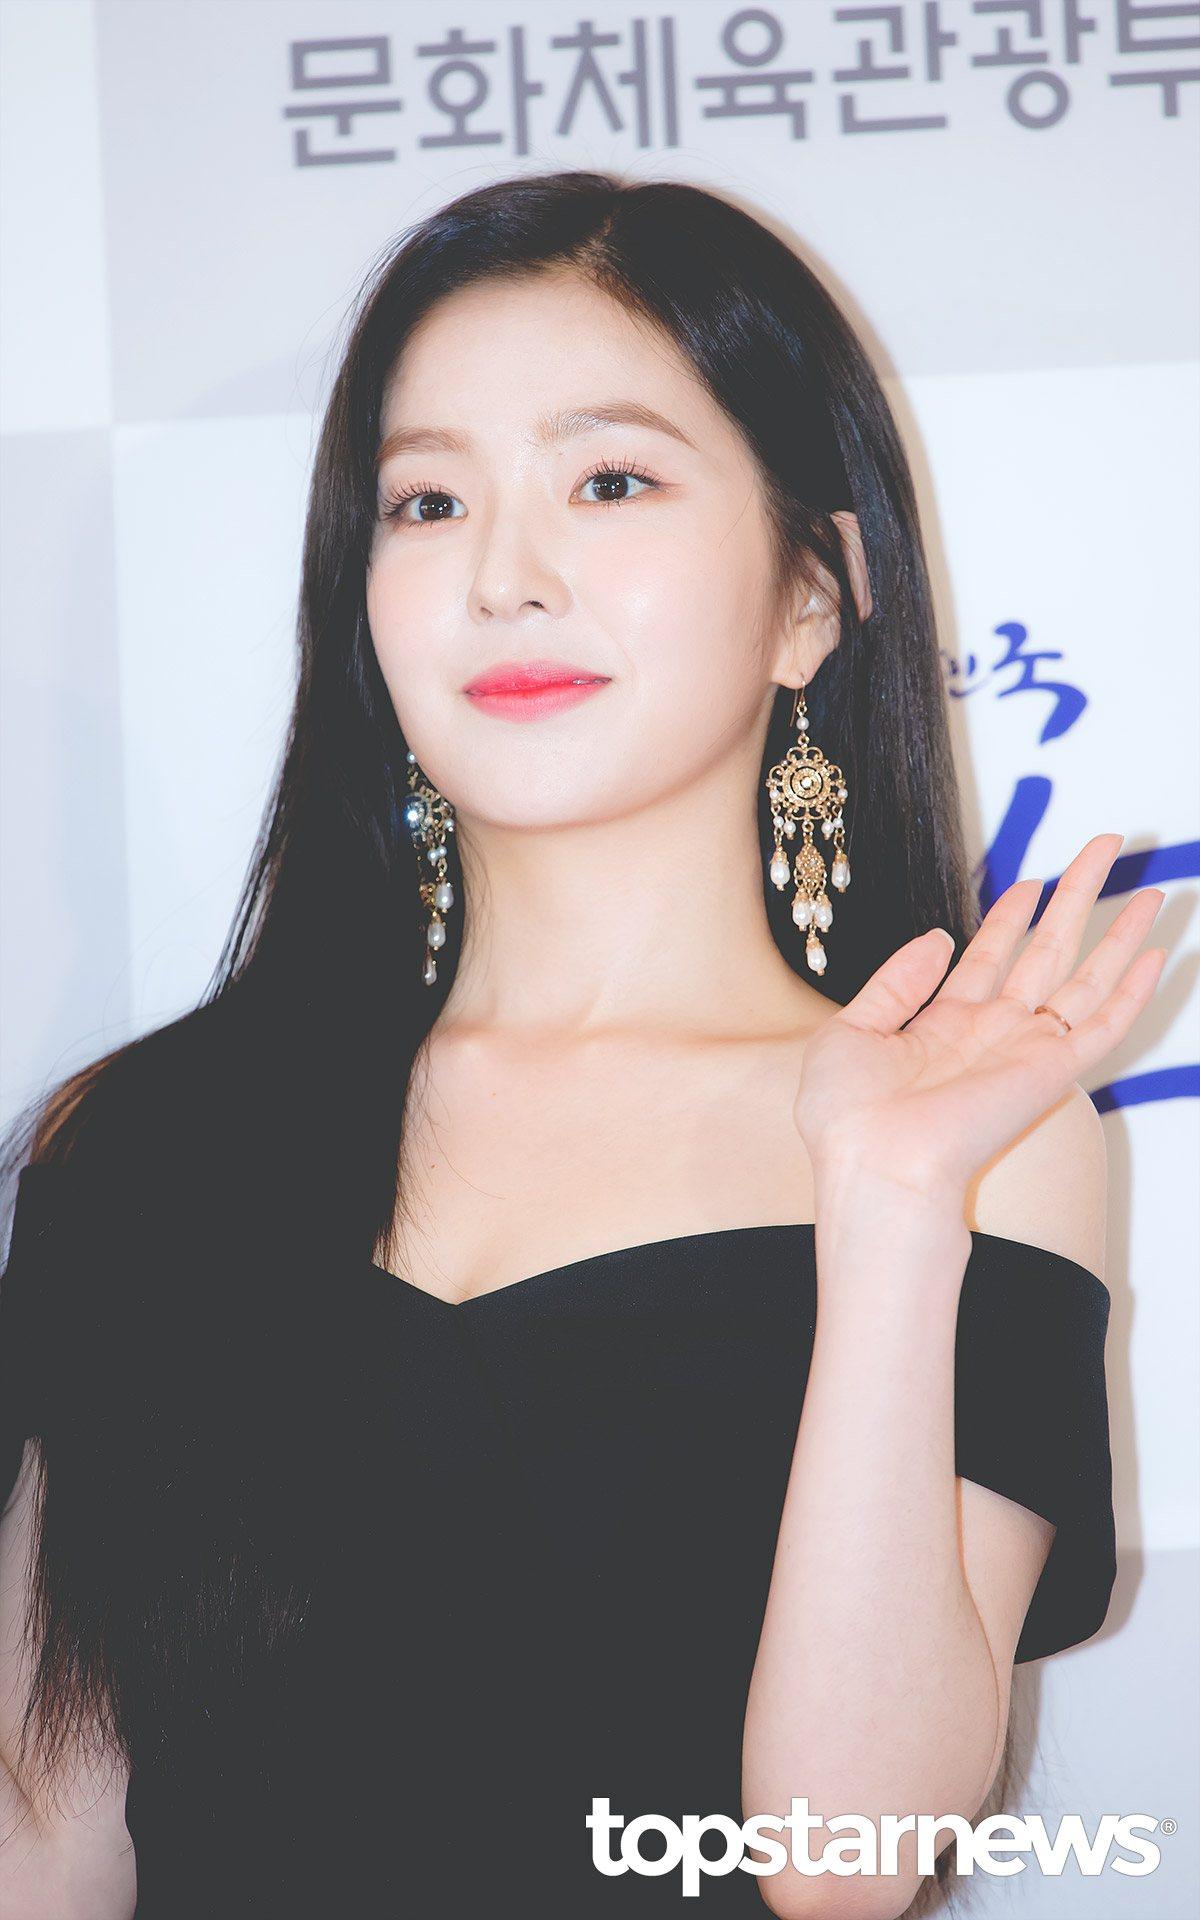 # Red Velvet - Irene 都說Irene的臉蛋讓人知道何謂「美貌」,不管看到幾次都還是會忍不住發出讚嘆聲阿~~~